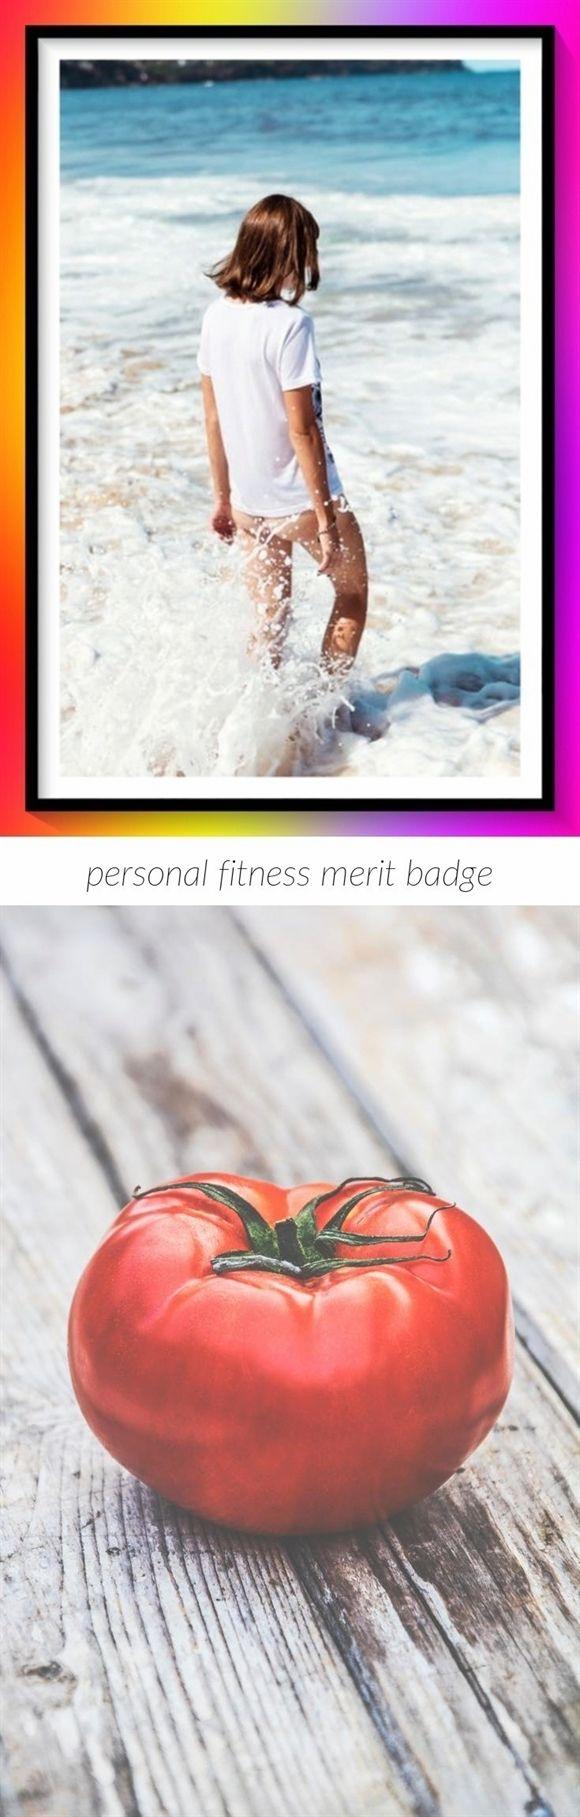 personal fitness merit badge_586_20181007140835_52 public